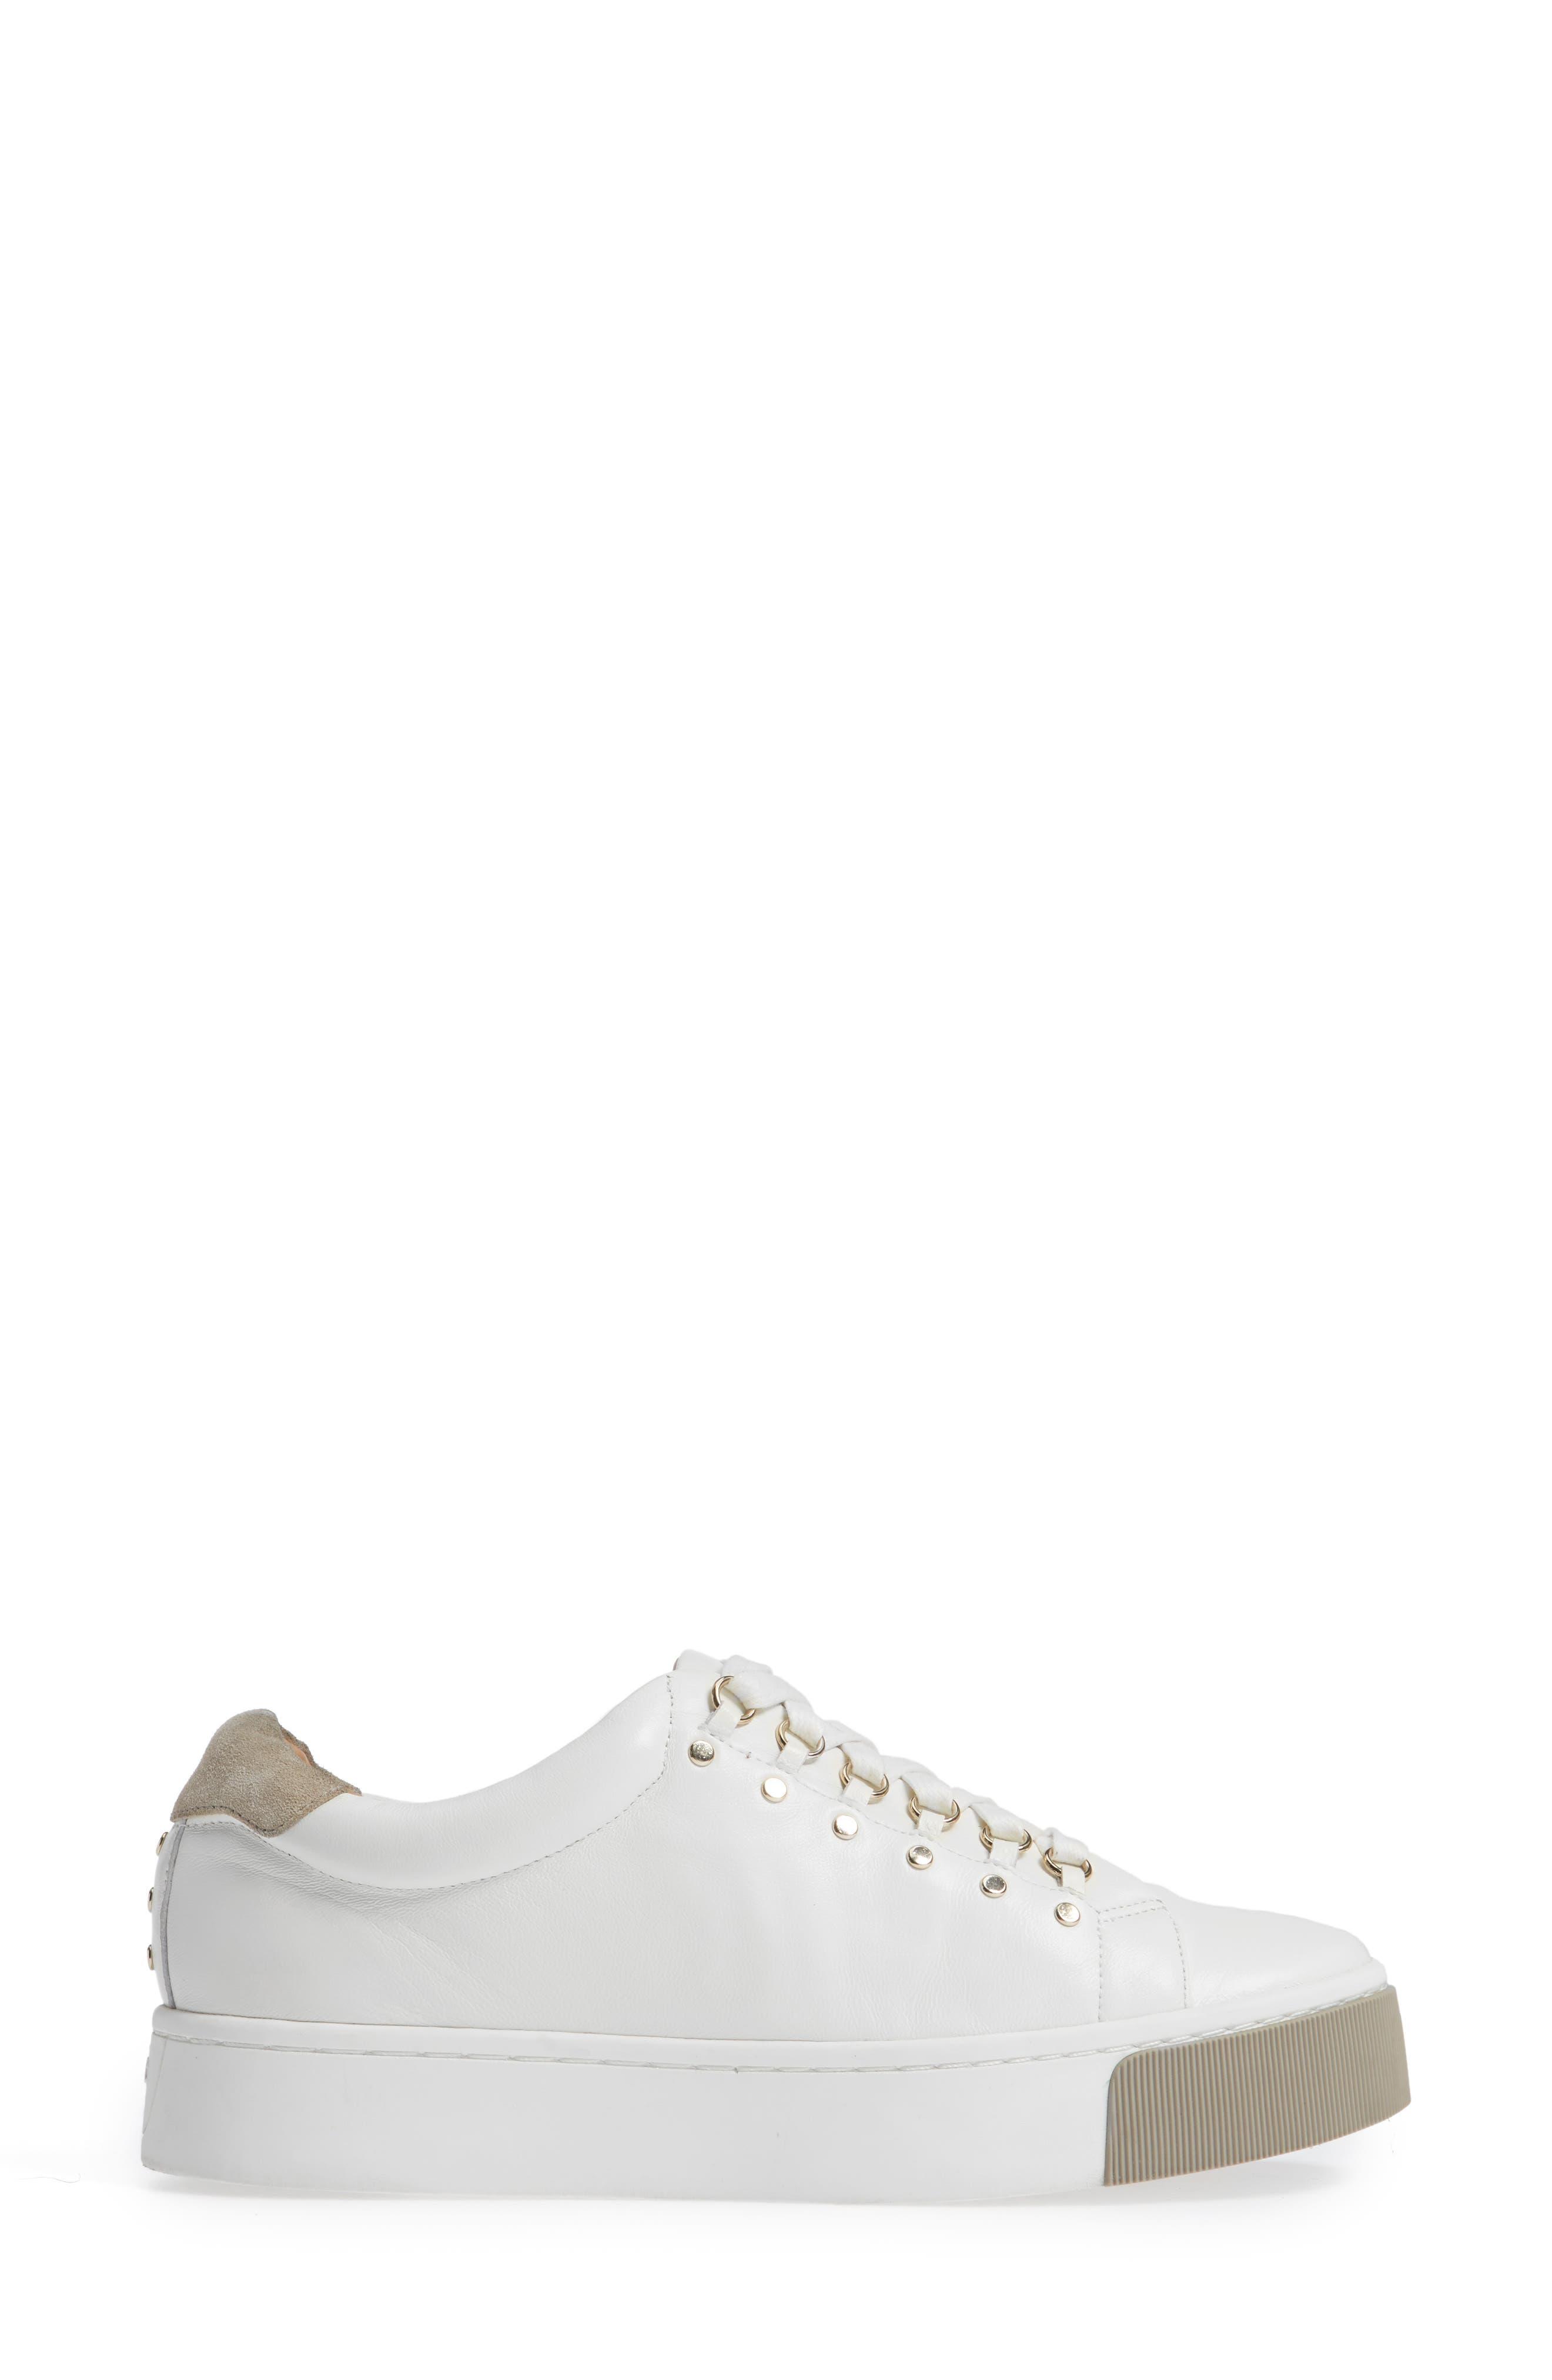 Handan Lace-Up Sneaker,                             Alternate thumbnail 3, color,                             WHITE